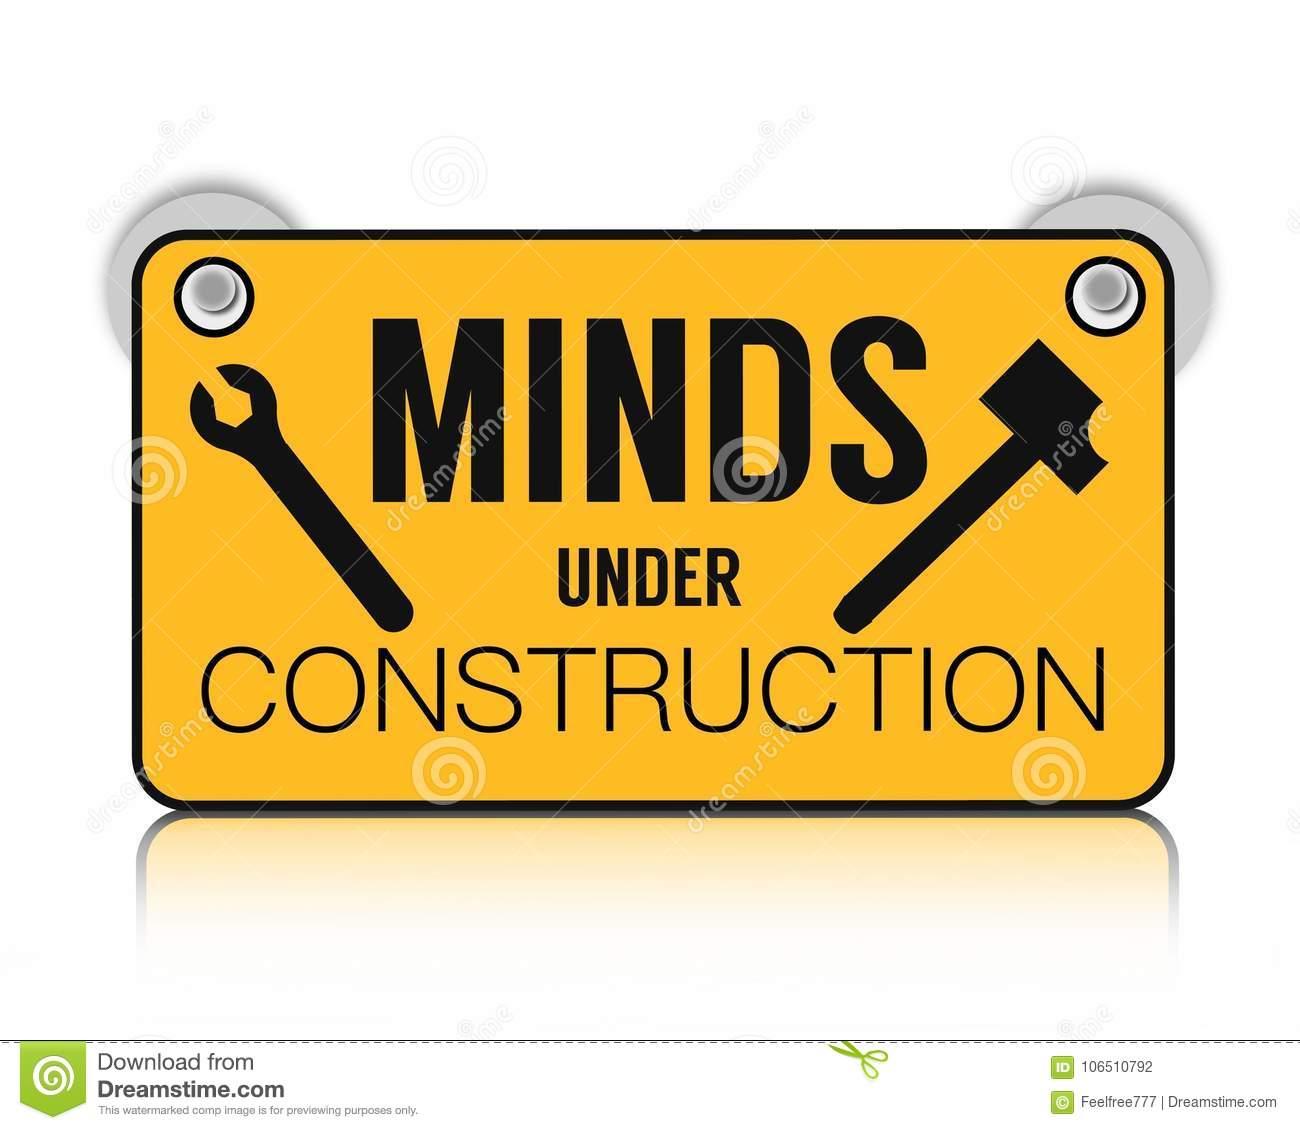 Minds under construction stock illustration. Illustration of.